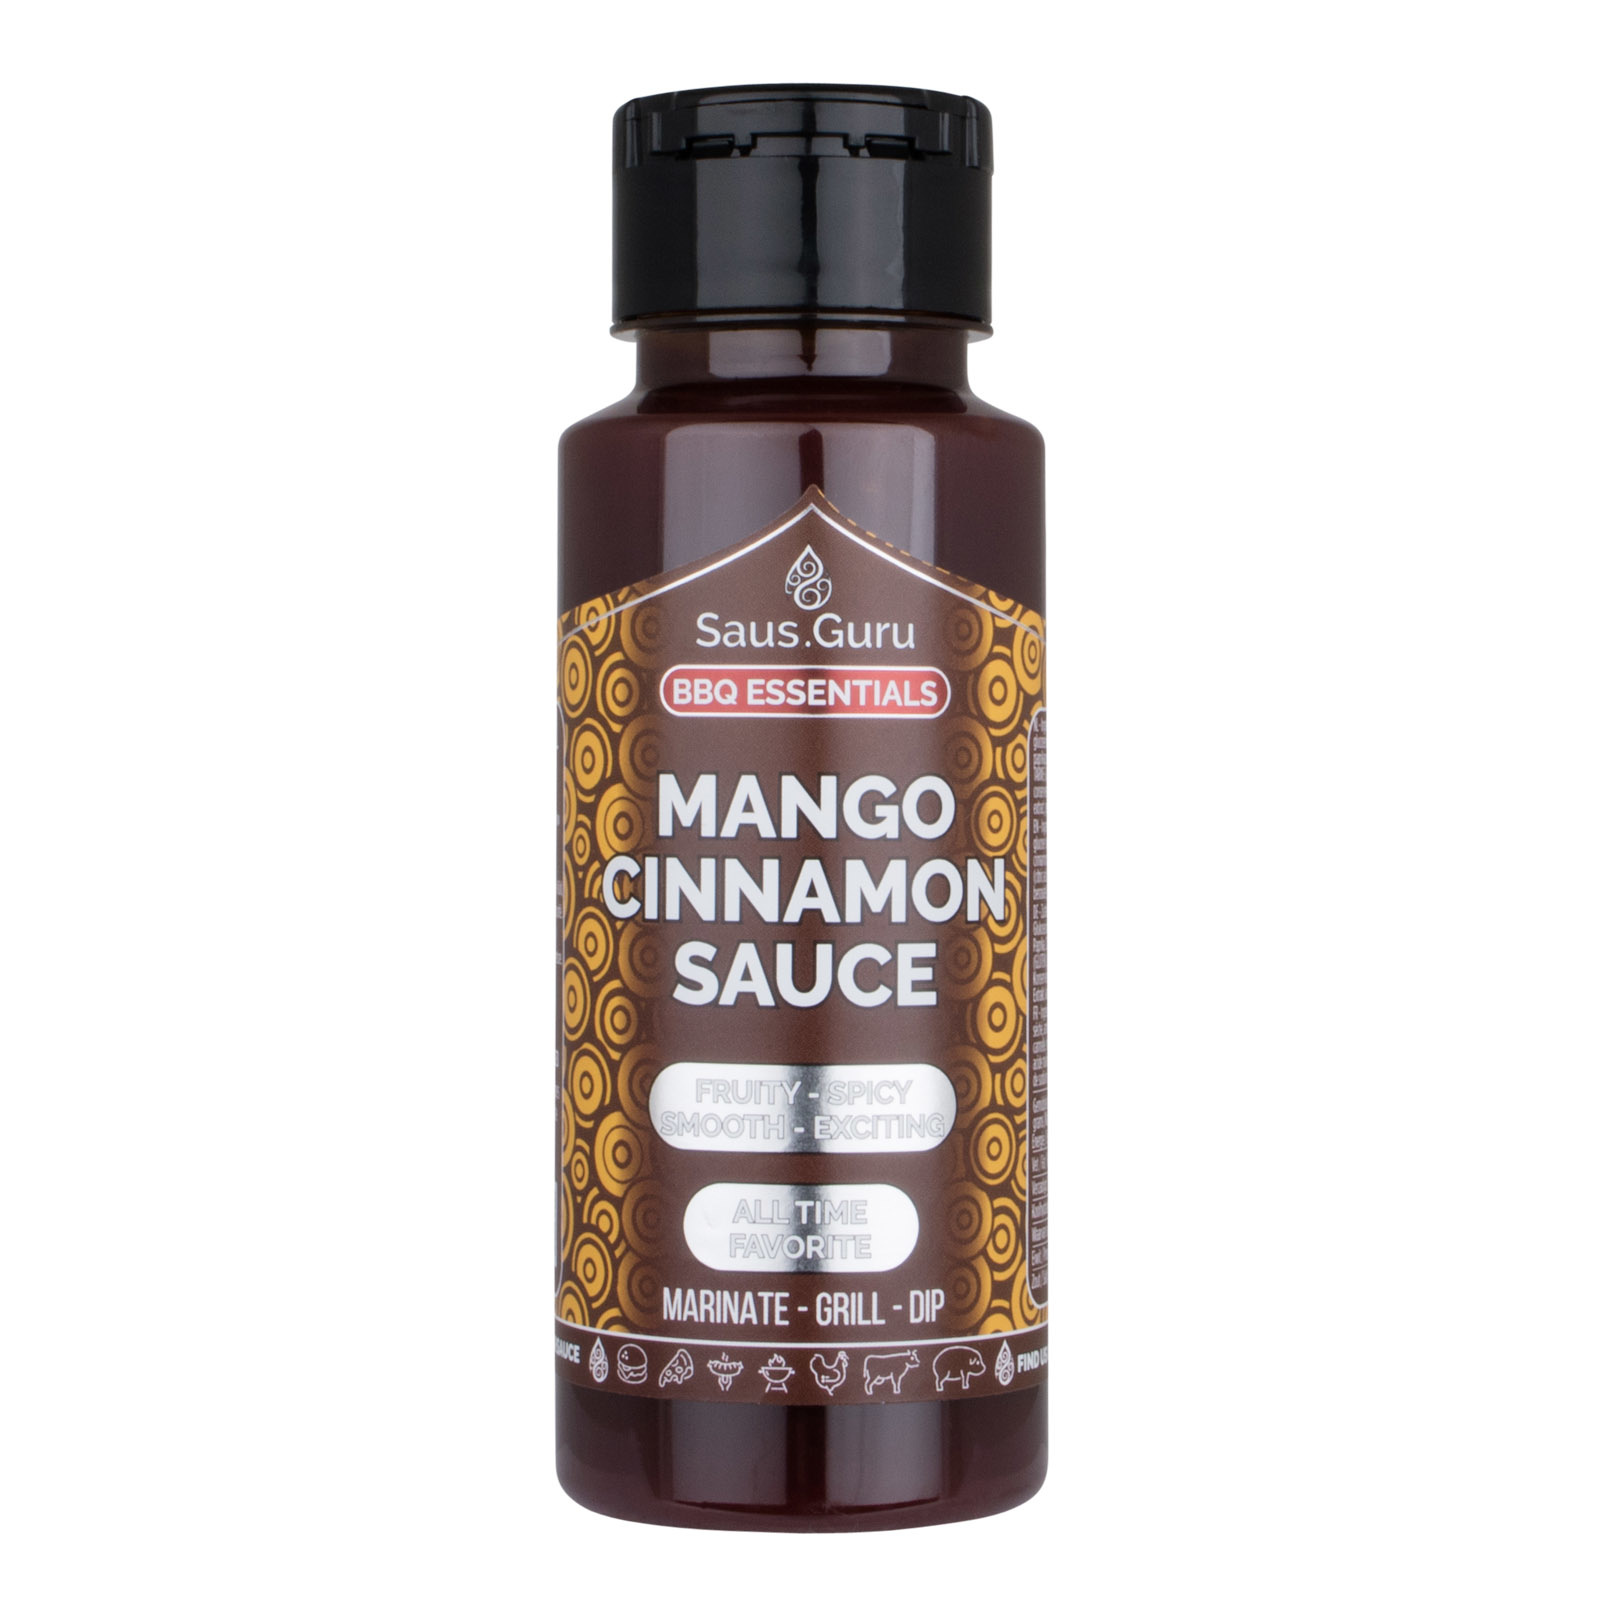 Saus.Guru's Mango Cinnamon BBQ Sauce-1